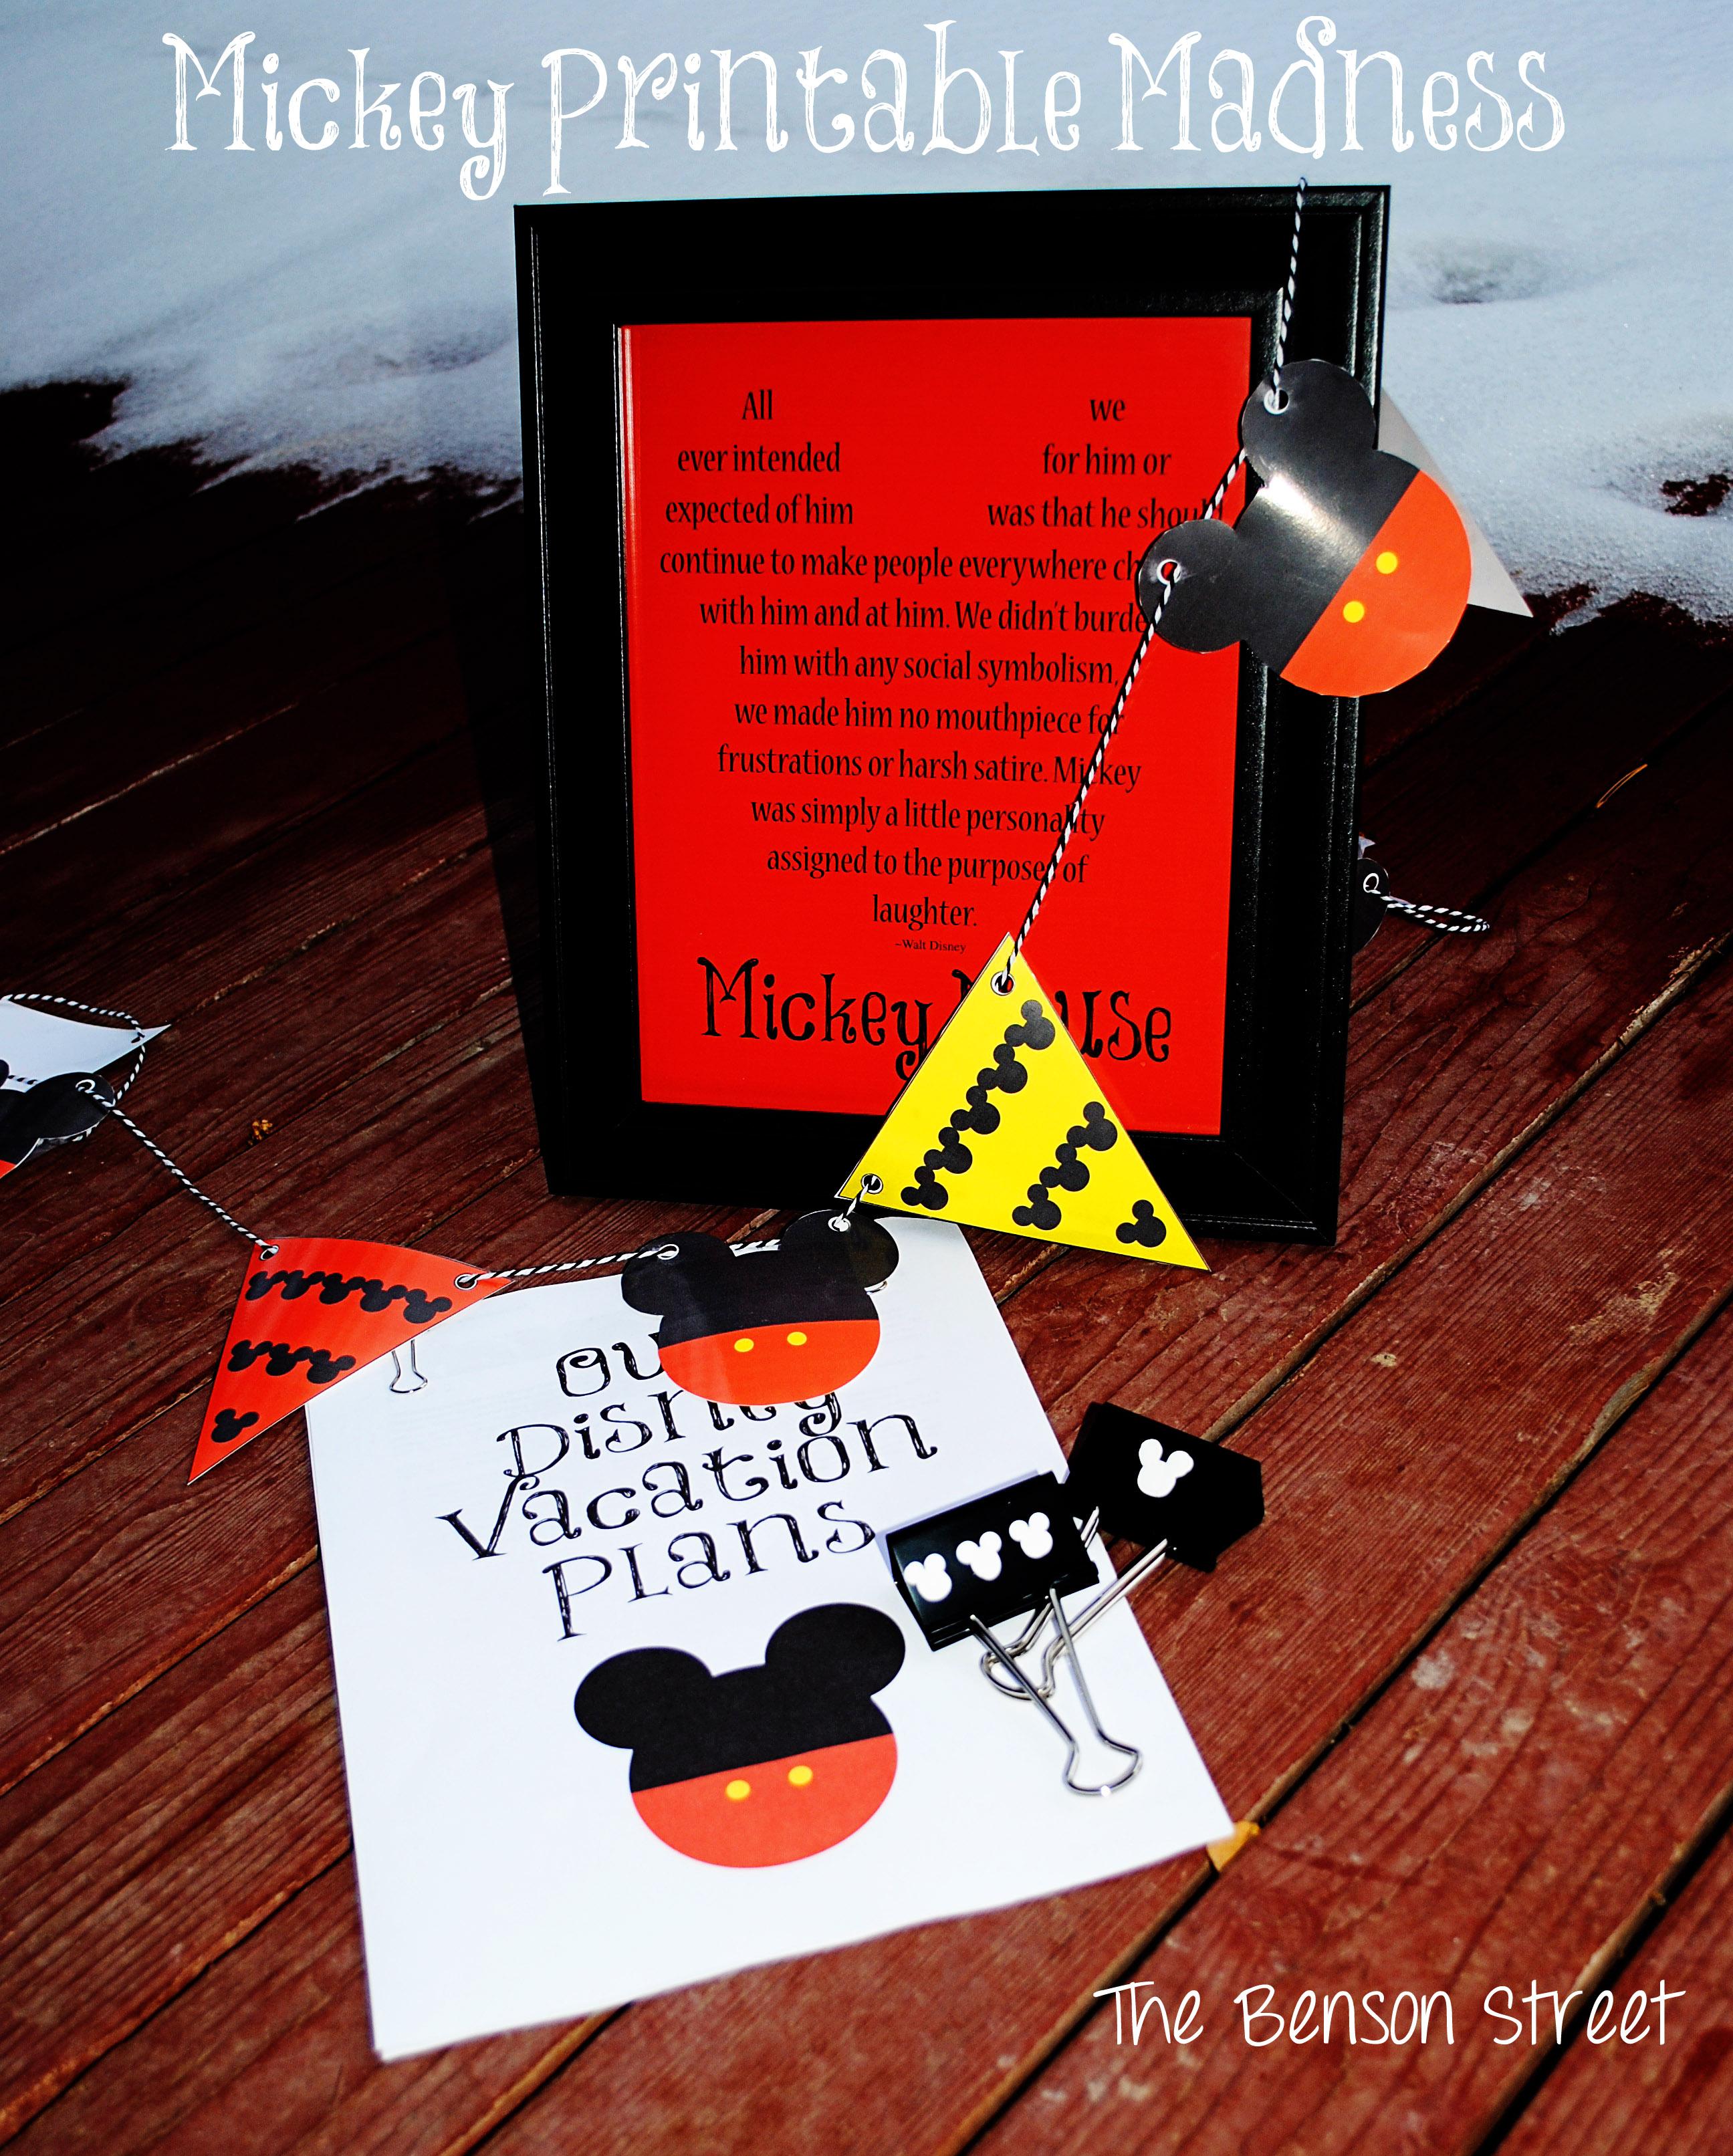 Mickey Printable Madness1